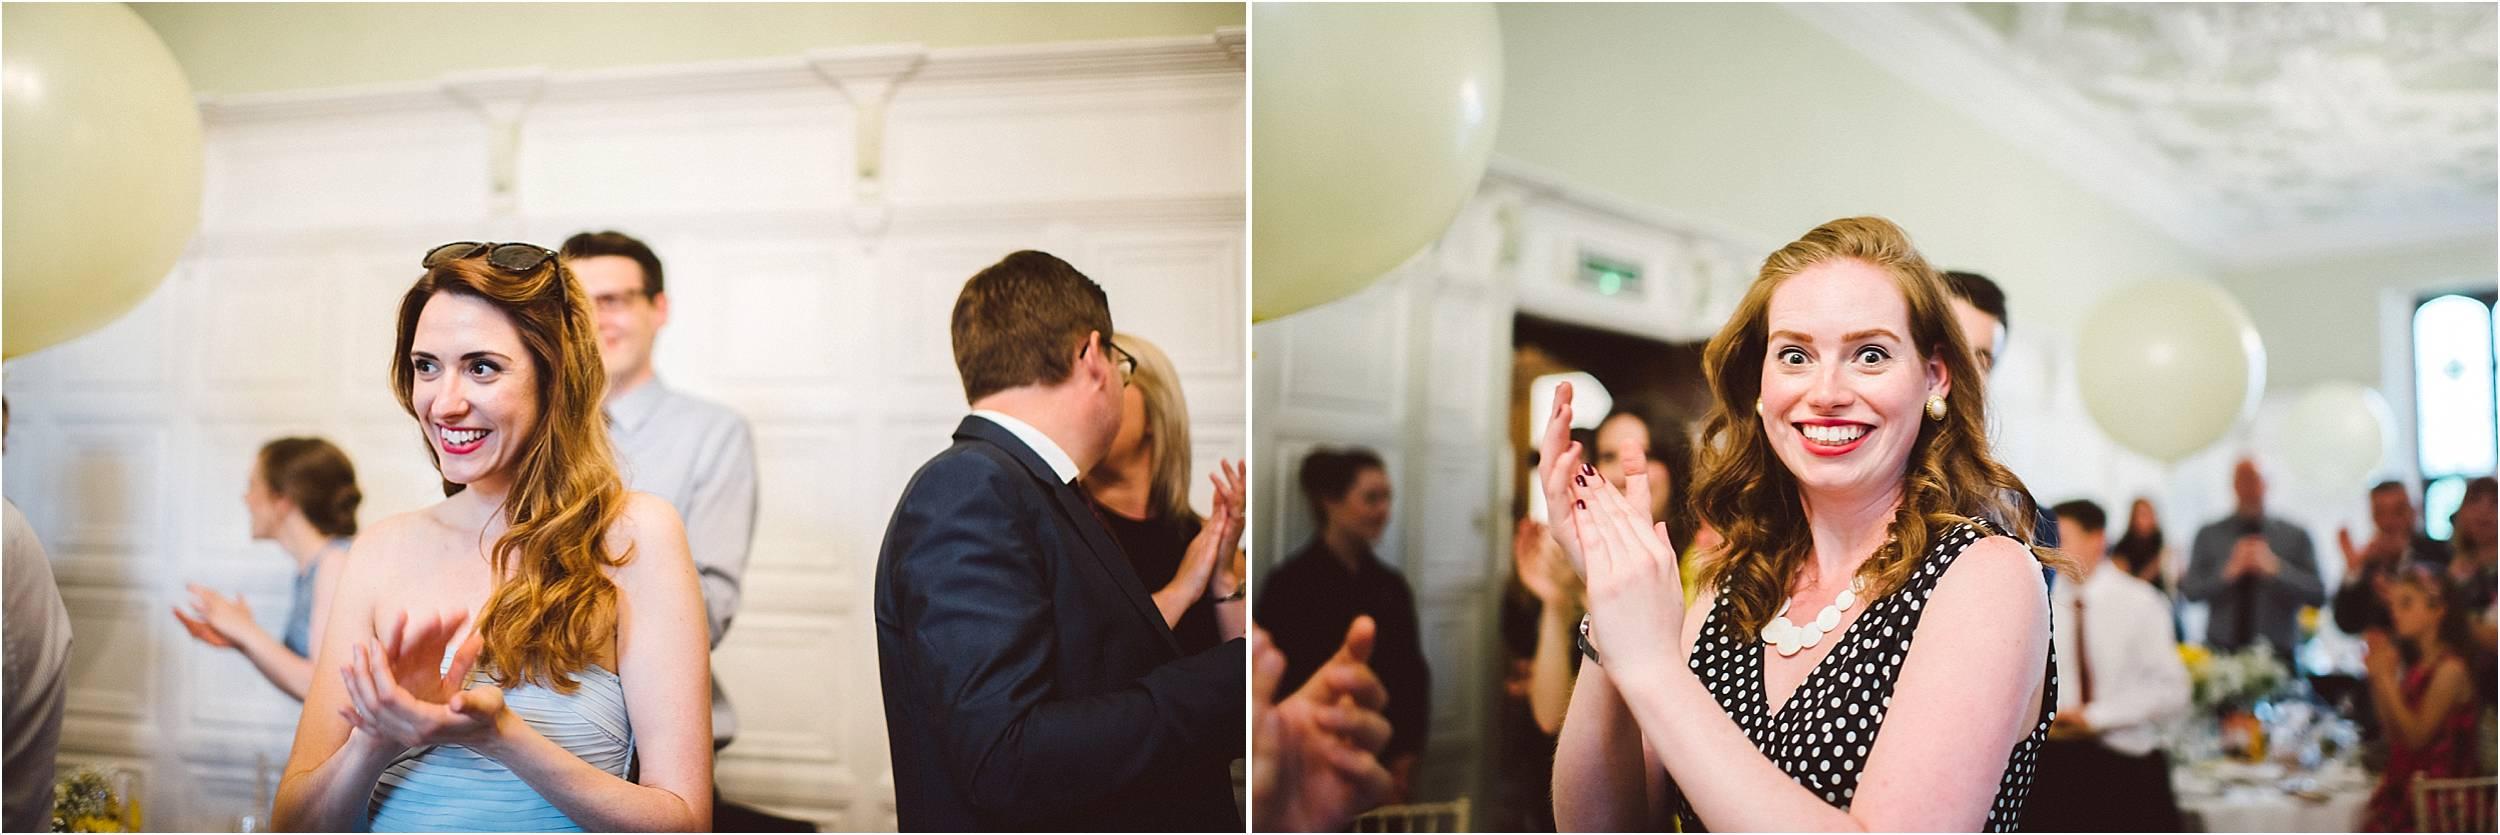 Hengrave Hall Wedding Photographer_0162.jpg